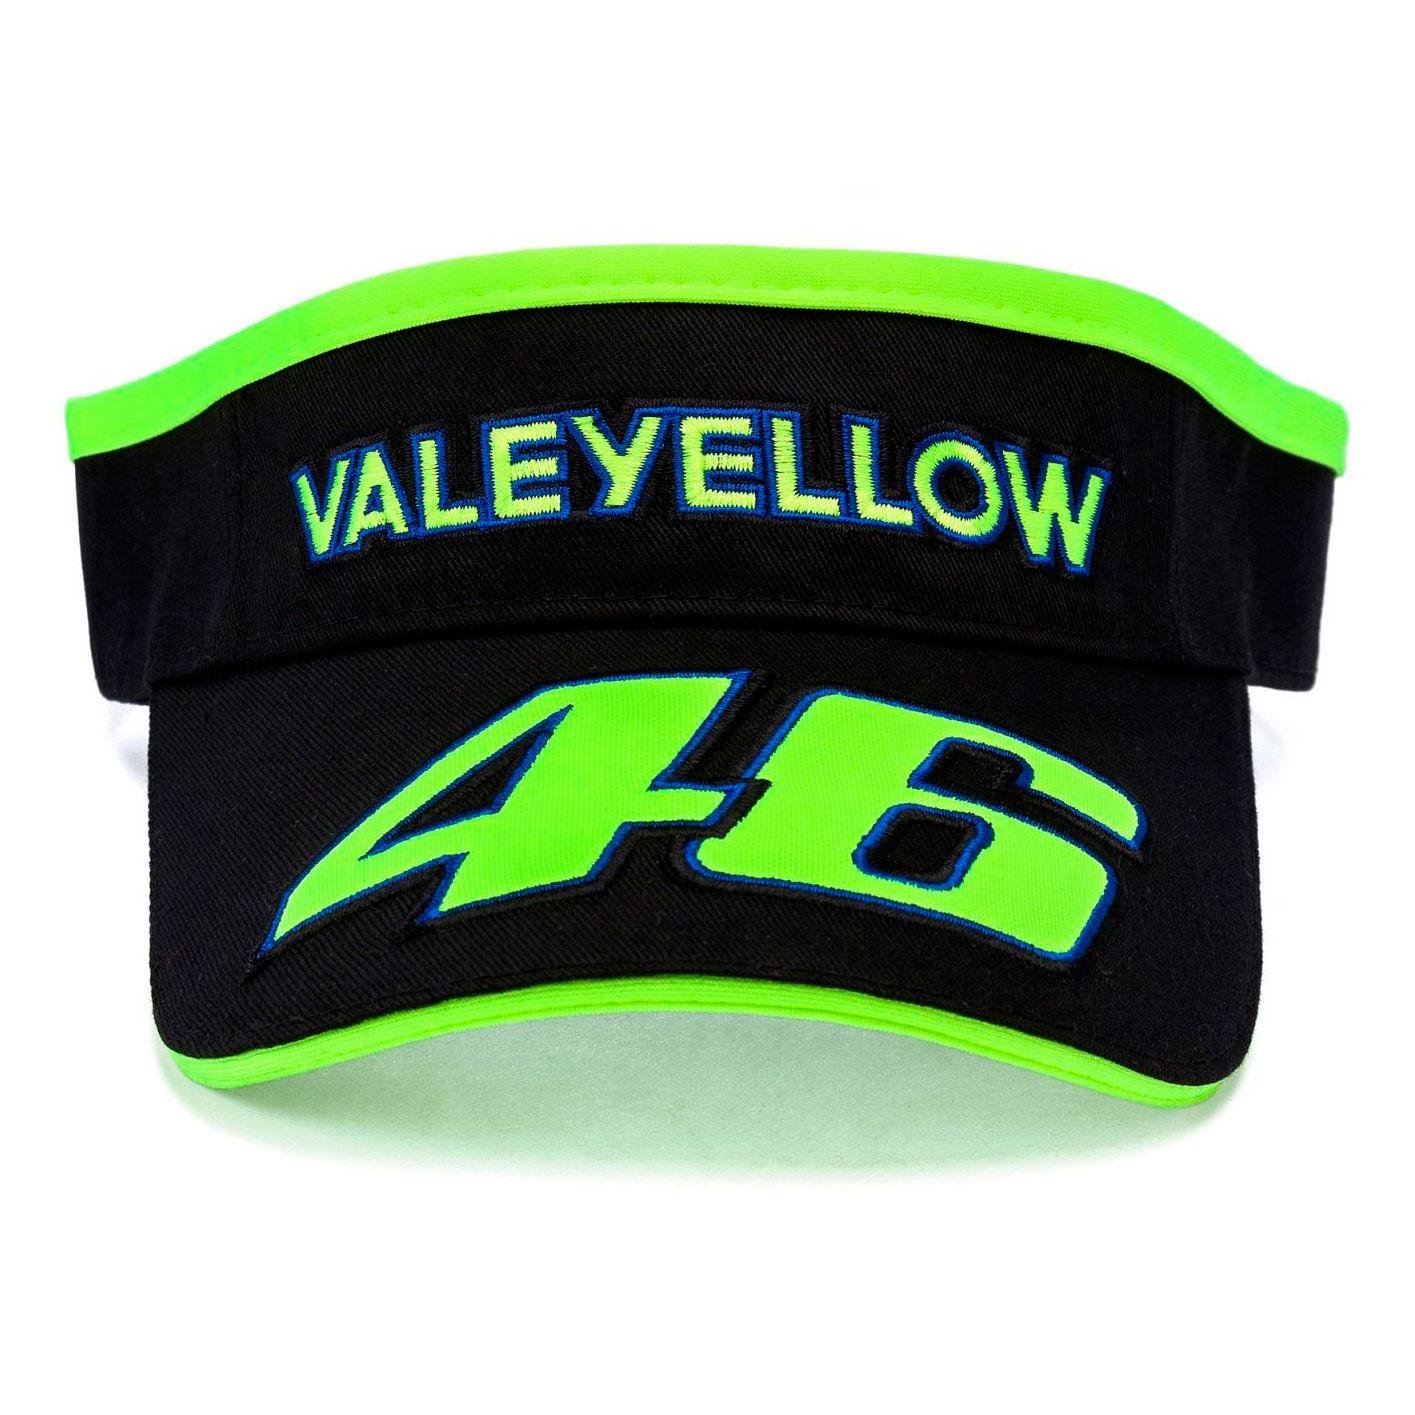 1f0b894642eba Gorra Valentino Rossi Valeyellow 46 Negra 2017 en Motorbike Store